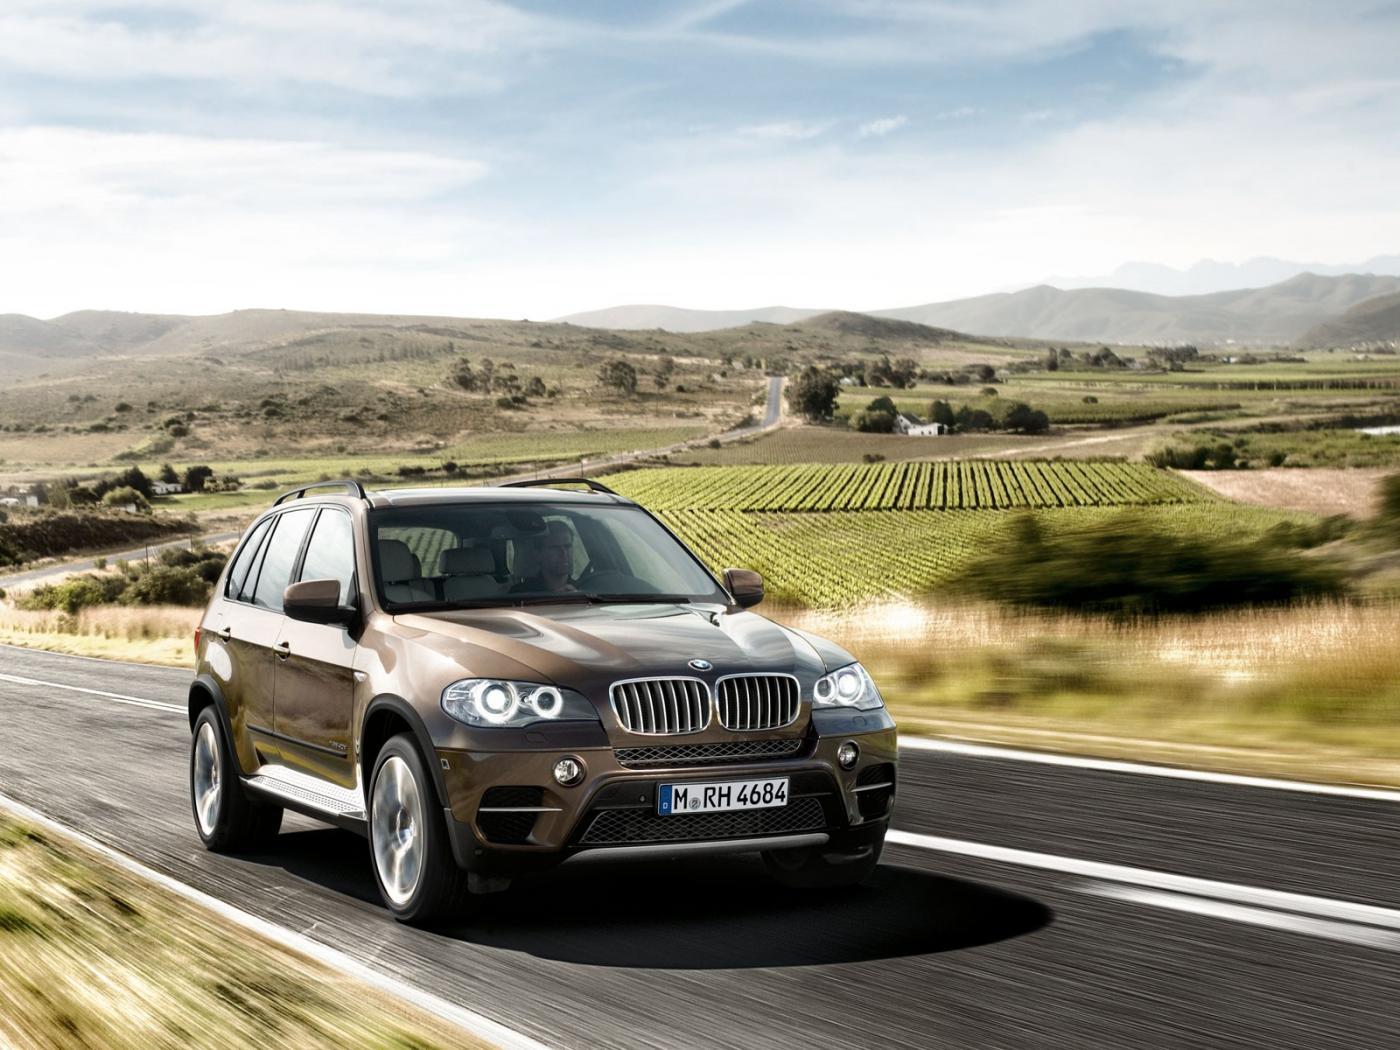 BMW-X5-E70-12.jpeg